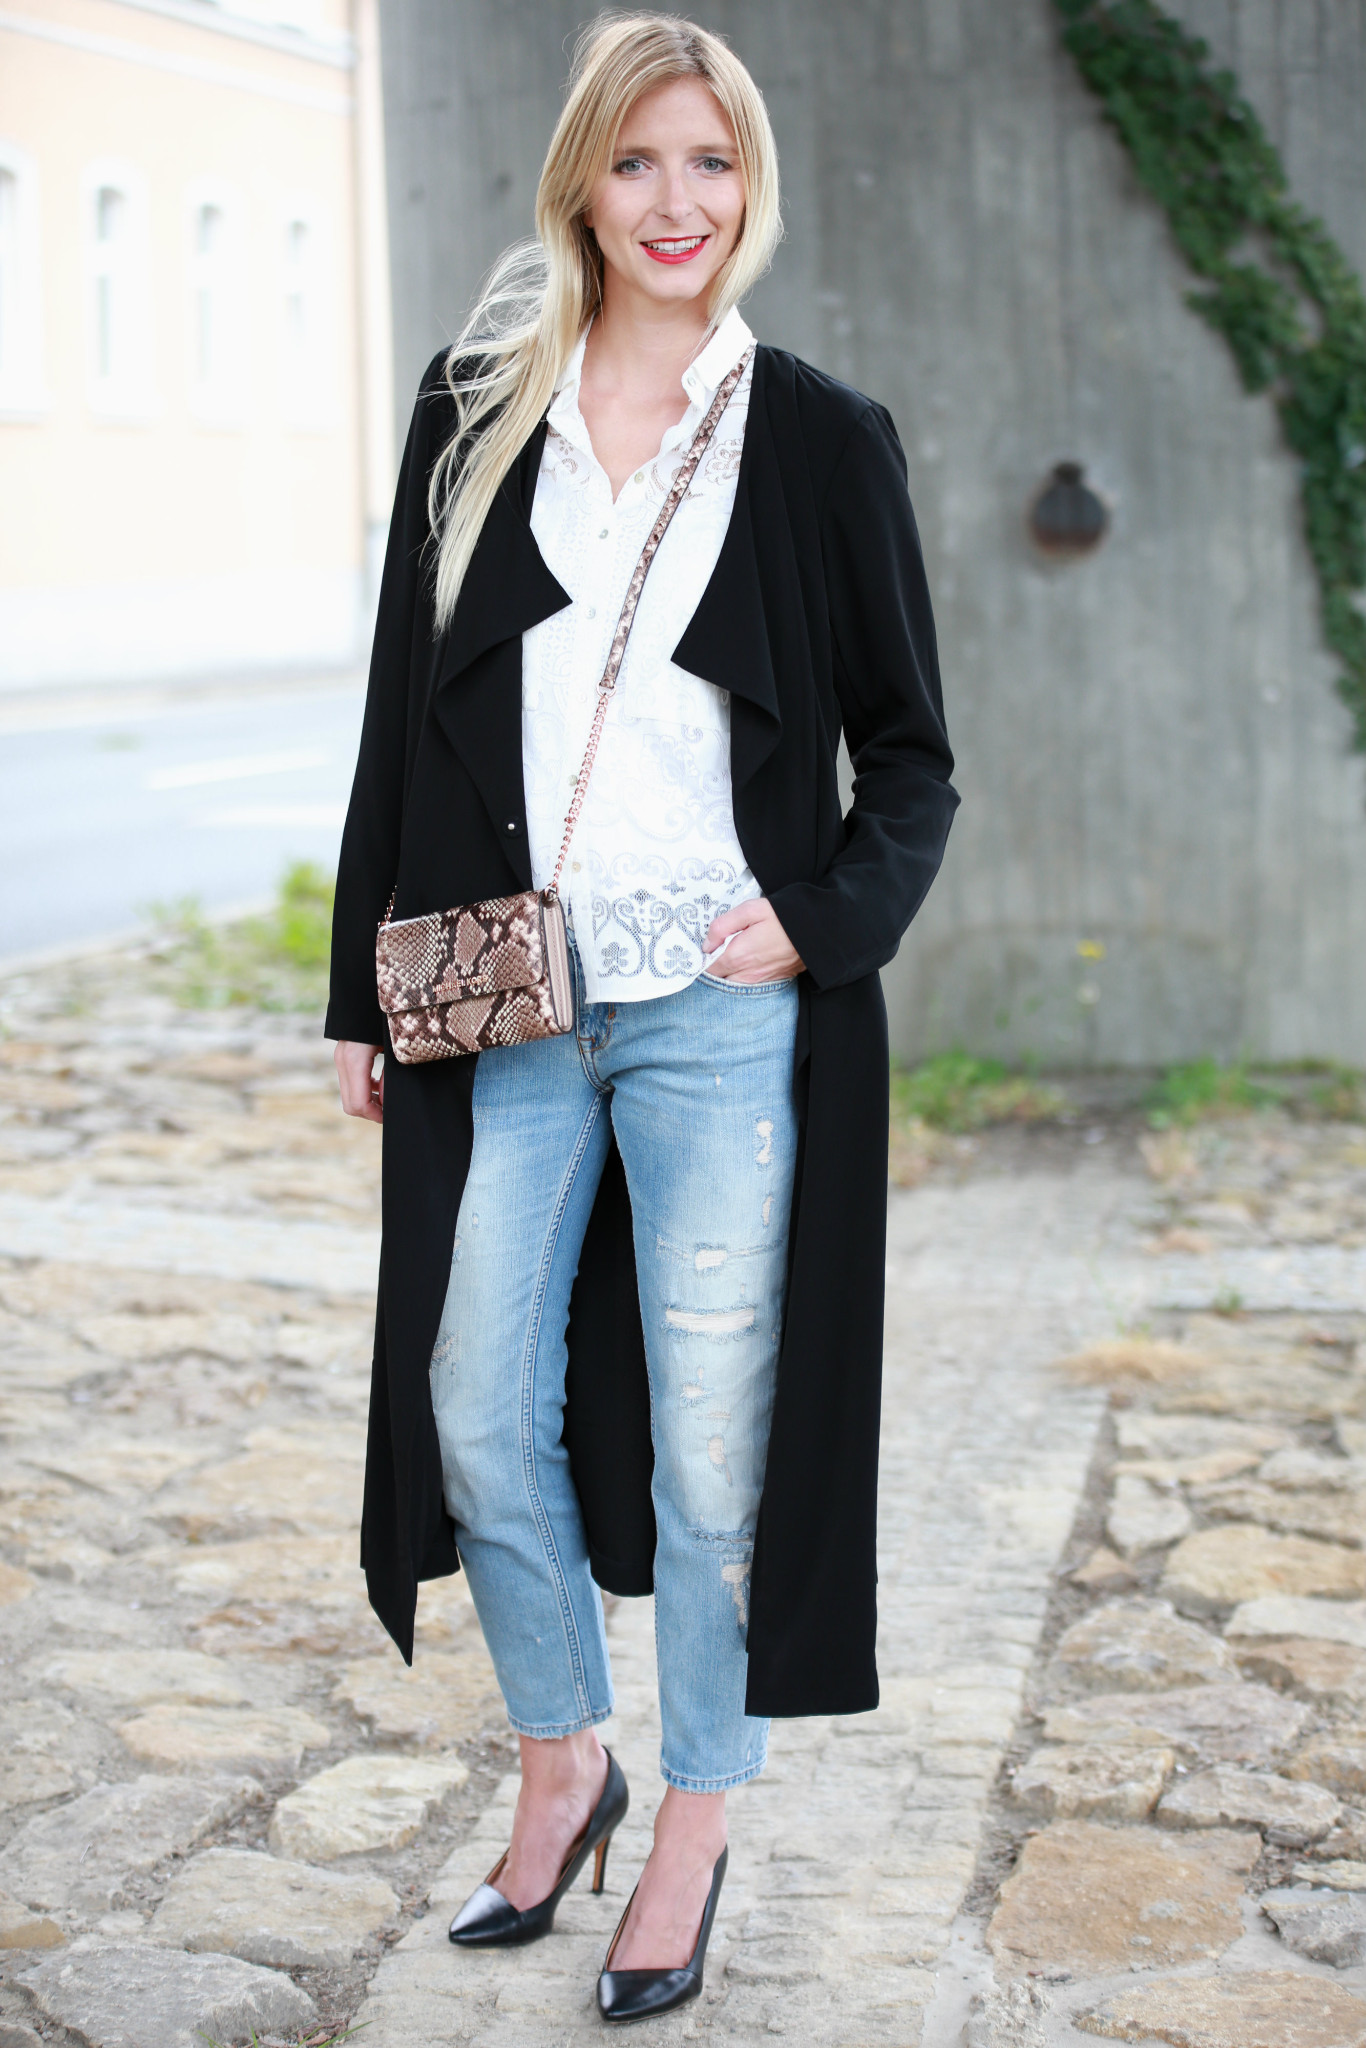 Fashion_Outfit_Michael_Kors_Jet_Set_45